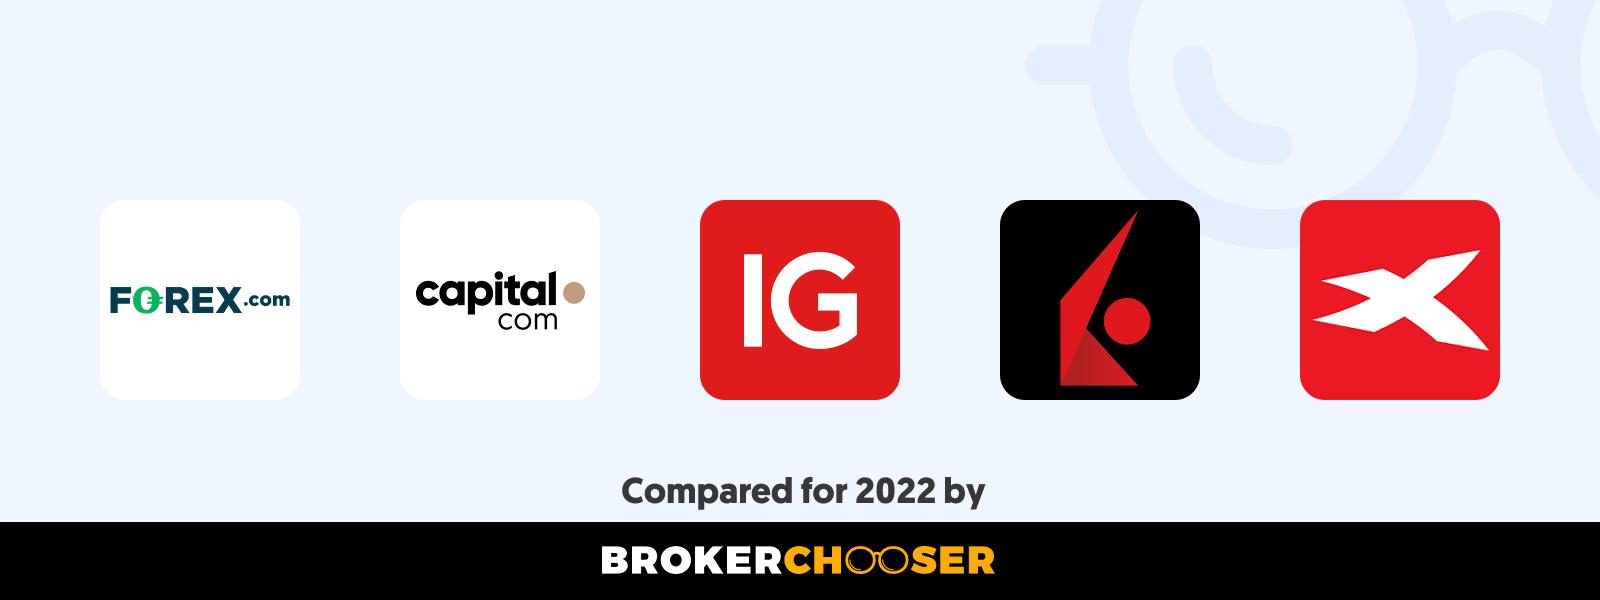 Best forex brokers for beginners in Suriname in 2021